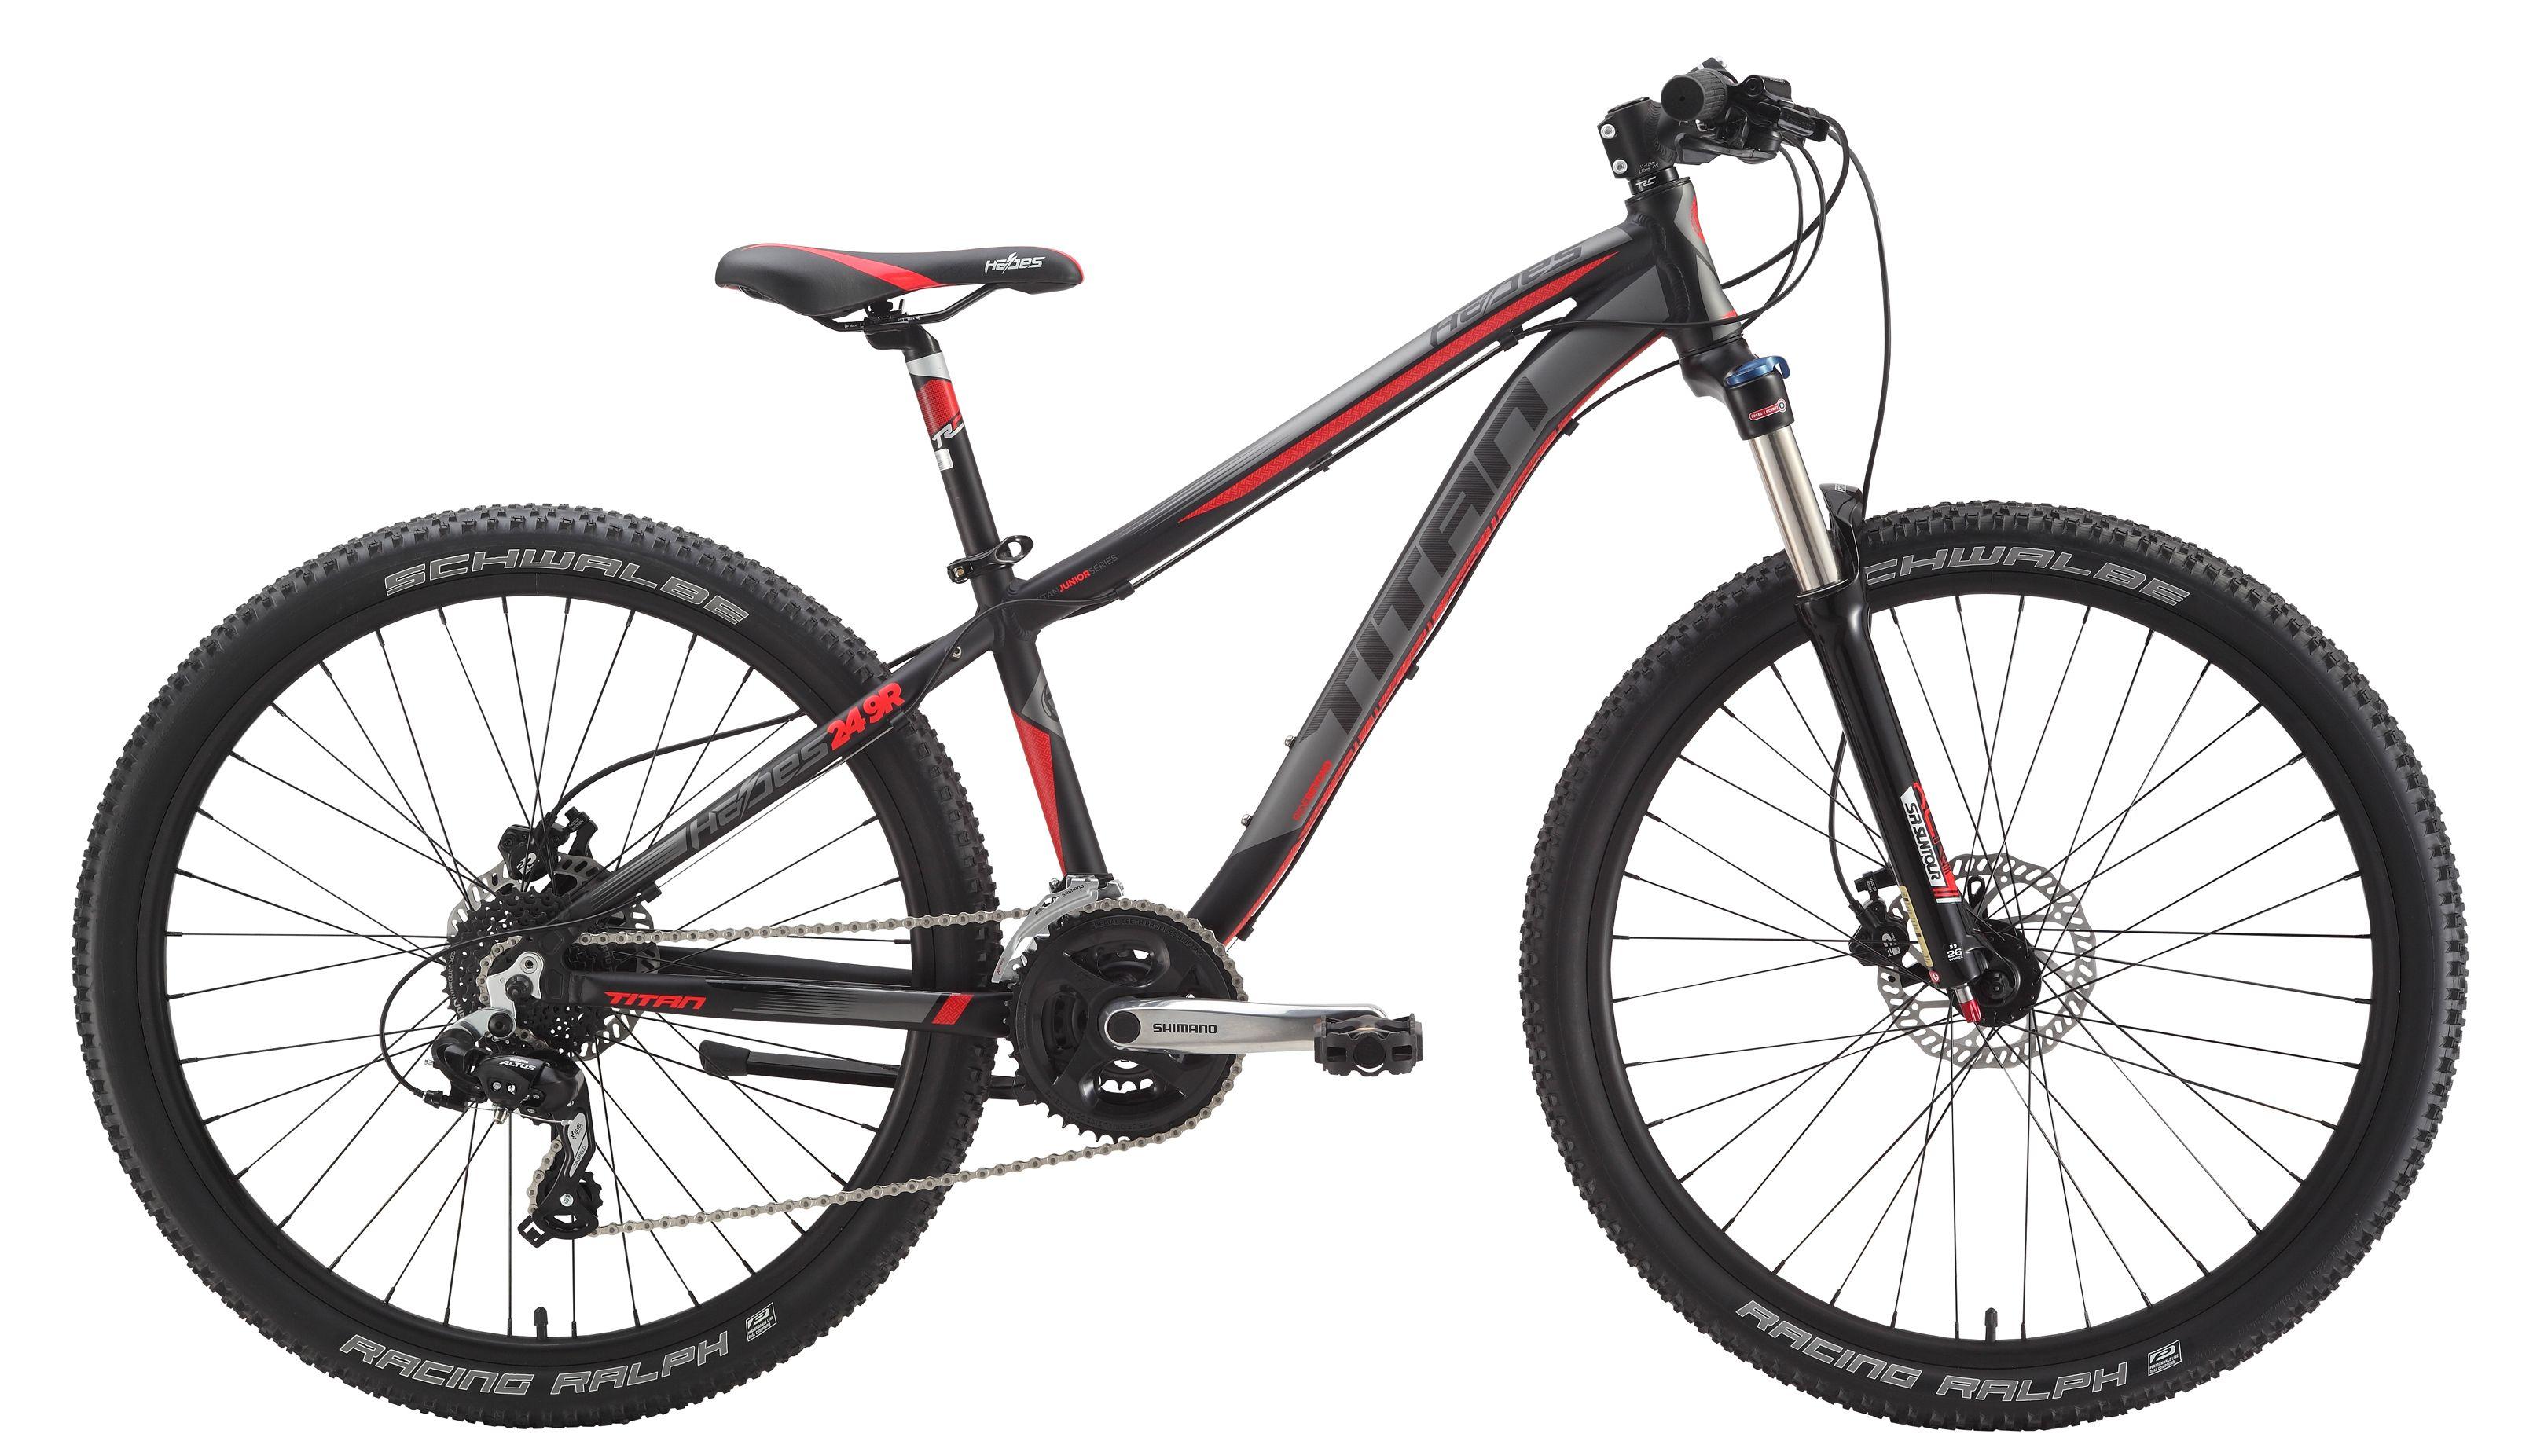 29f8f480cbc Titan Hades 24 9R PRO | Kids Bikes | Kids bike, Bike, Mountain biking